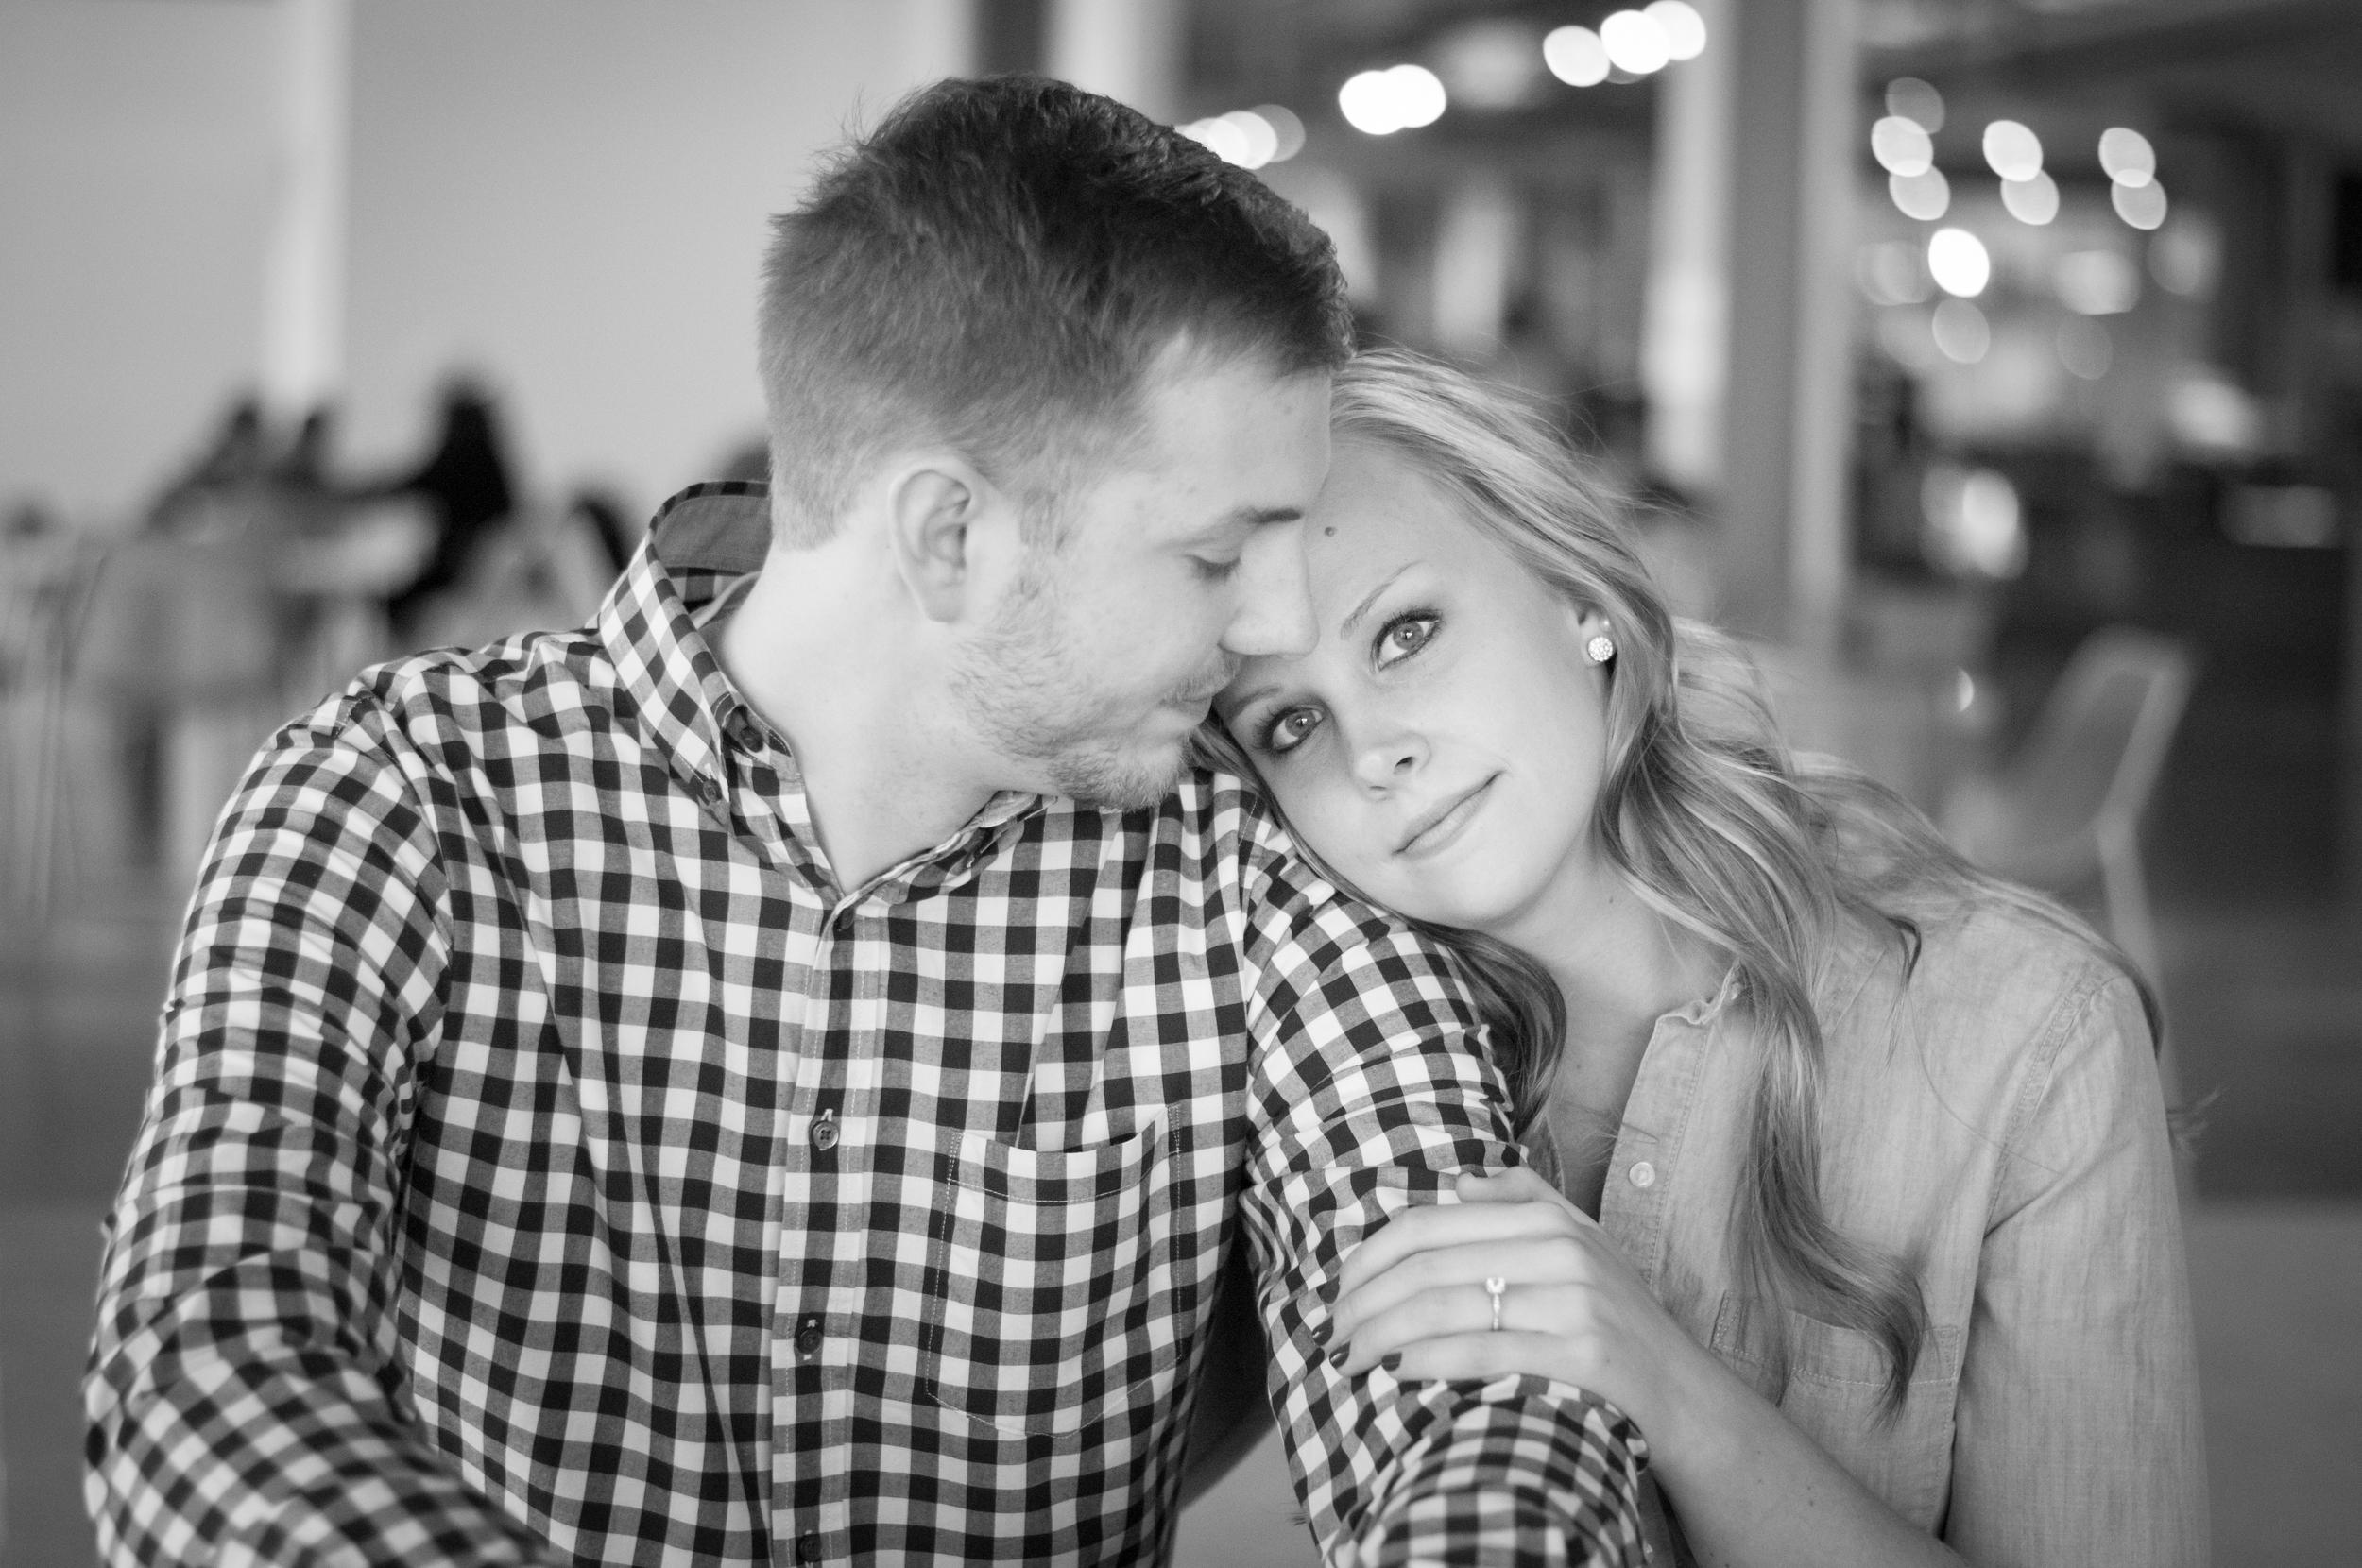 meredithdonnellyphotography-Engagement Kyleigh & Josh-33.jpg